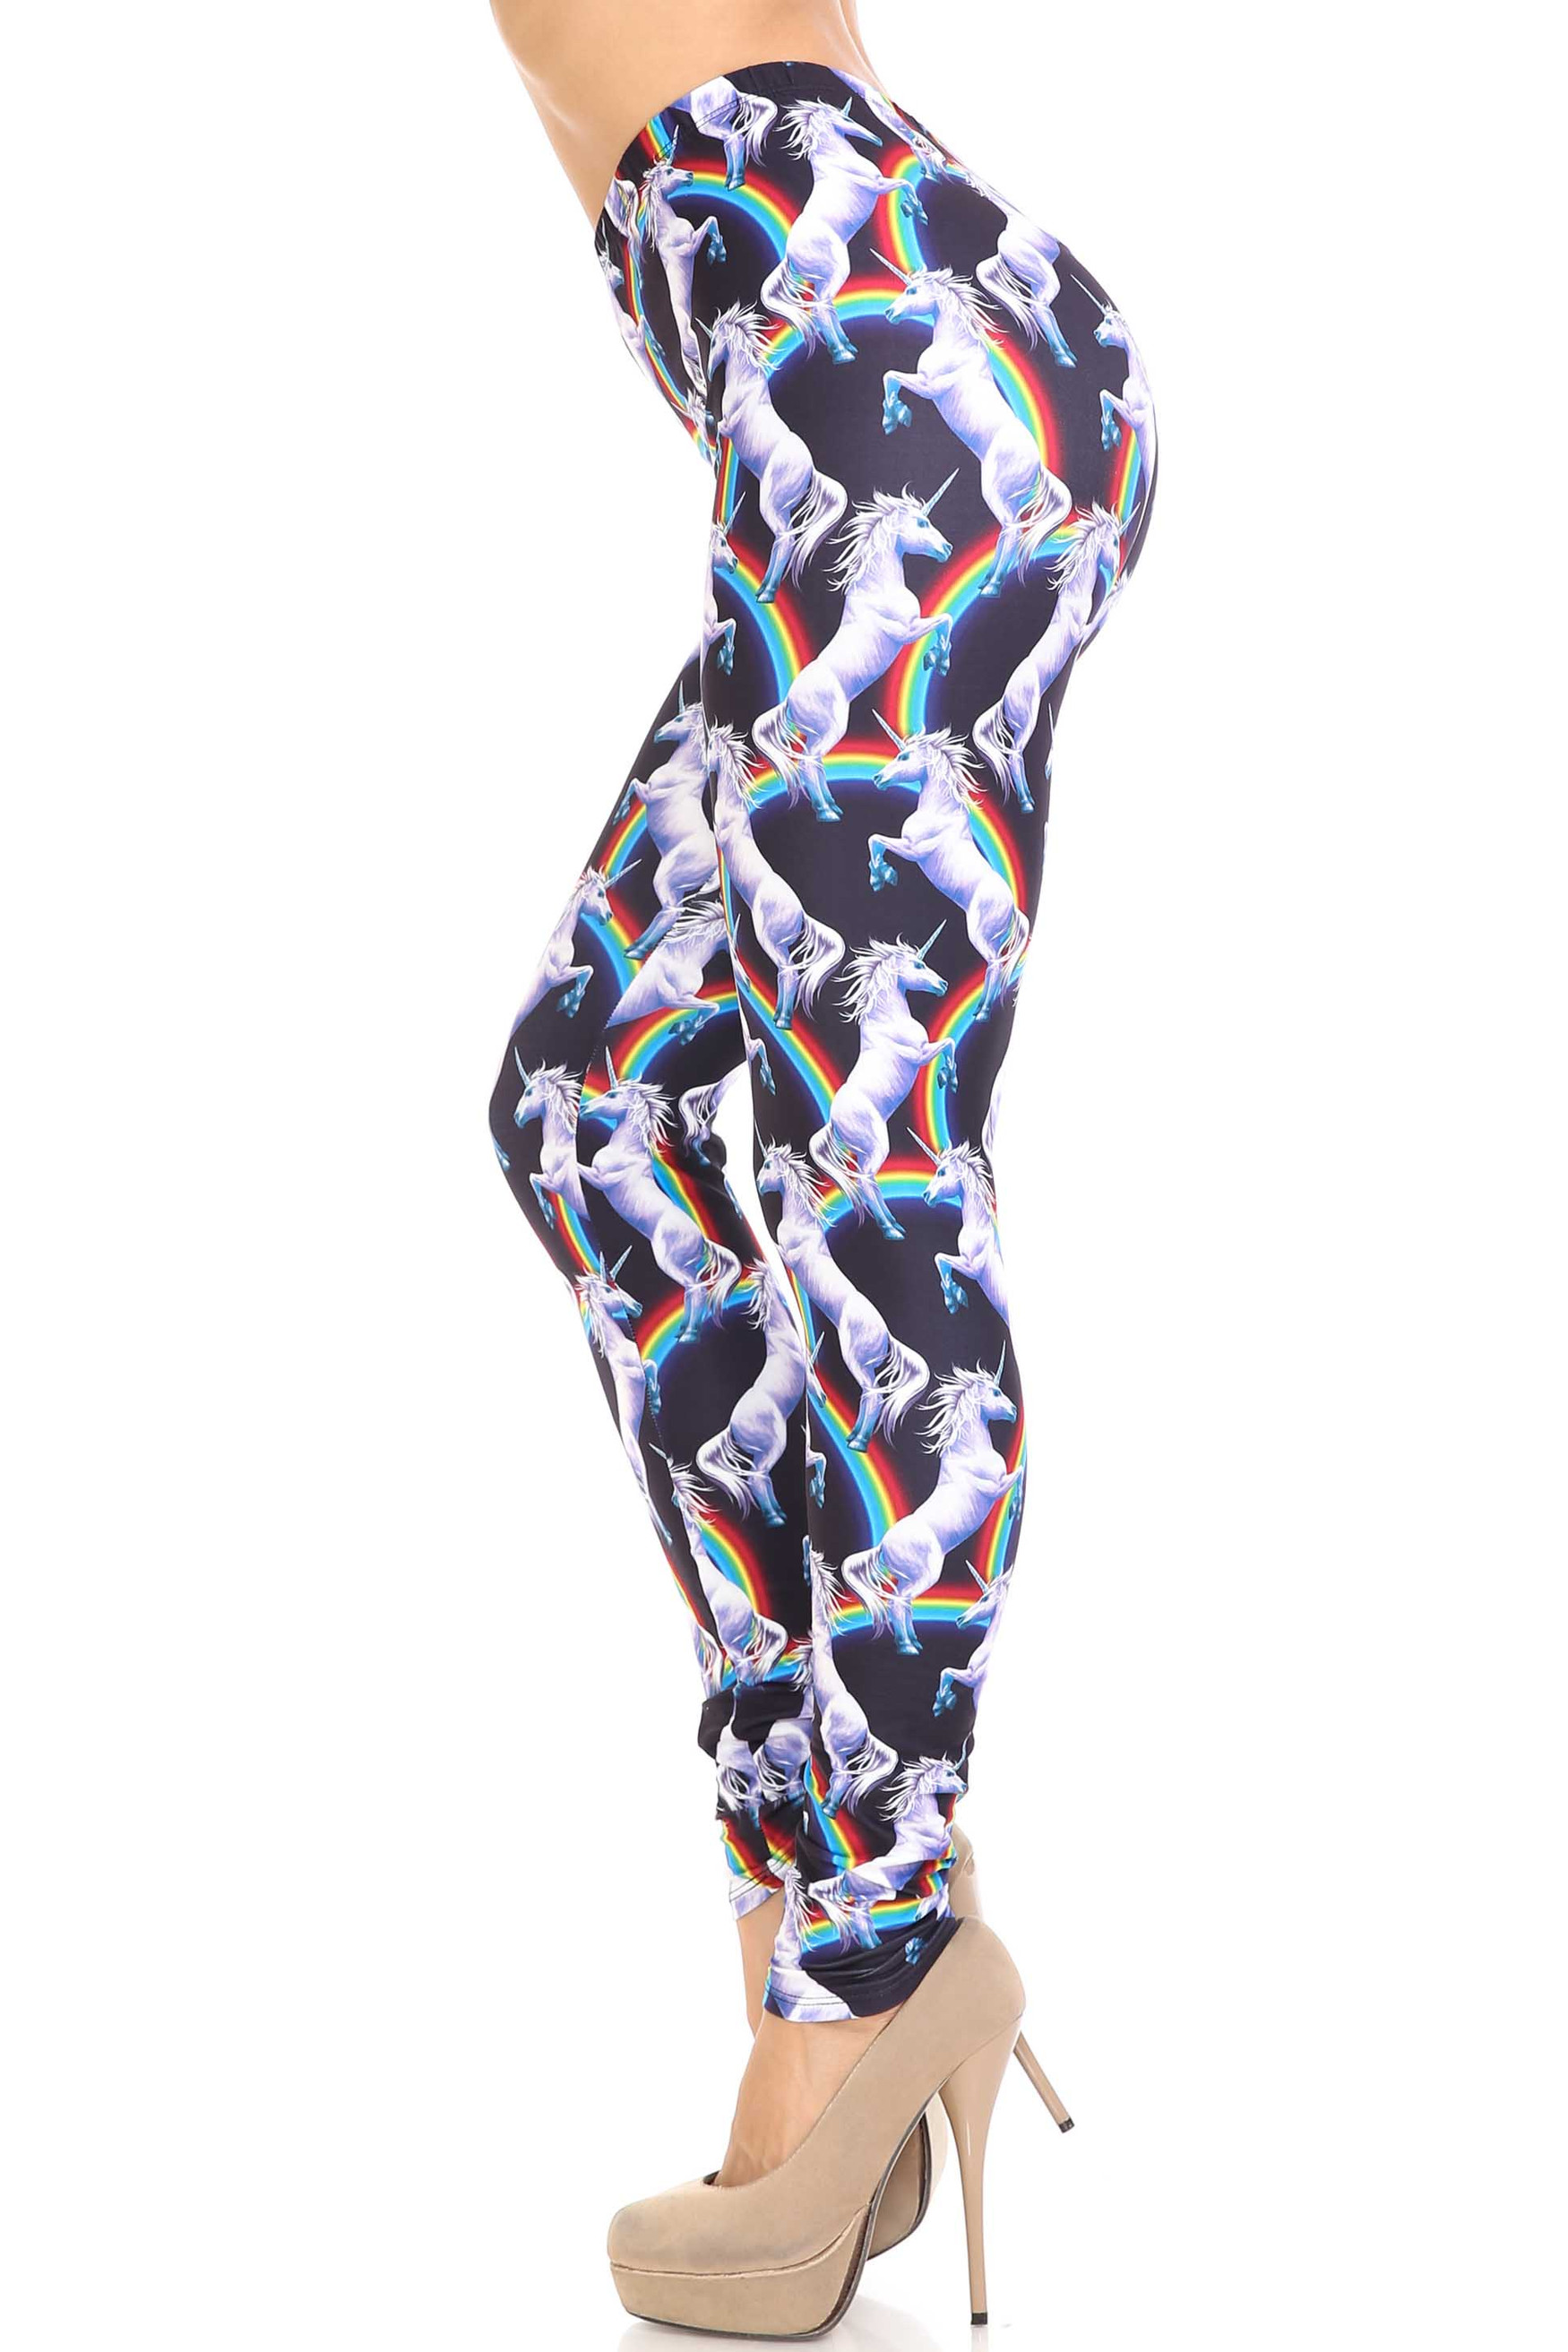 Creamy Soft Rainbow Unicorn Extra Plus Size Leggings - By USA Fashion™